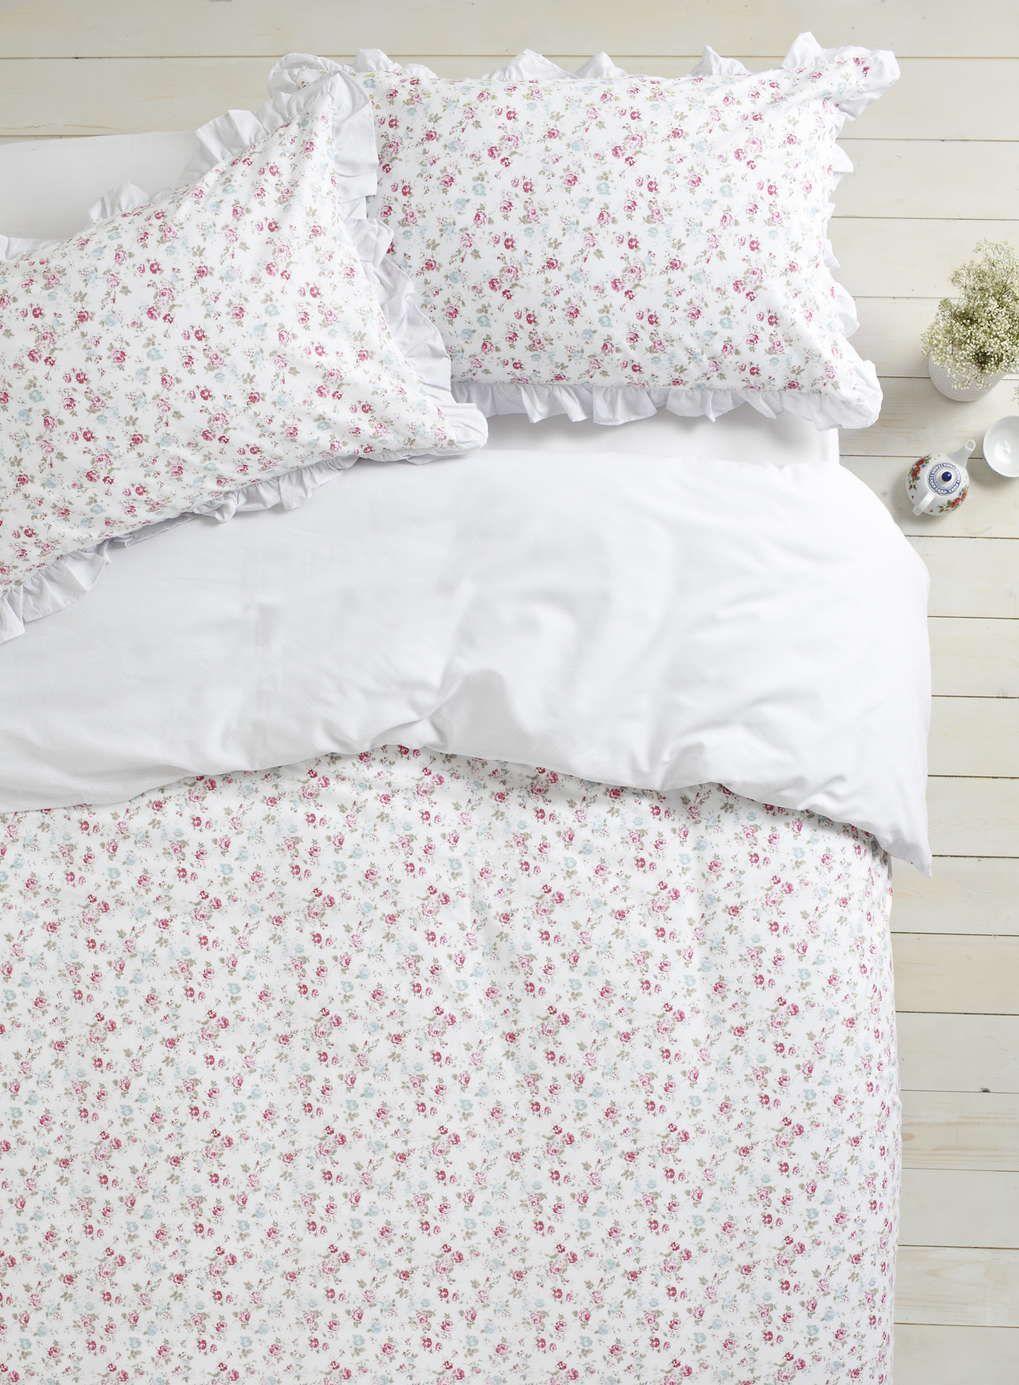 Esther Pink Ditsy Bedding Set Bhs Duvet Cover